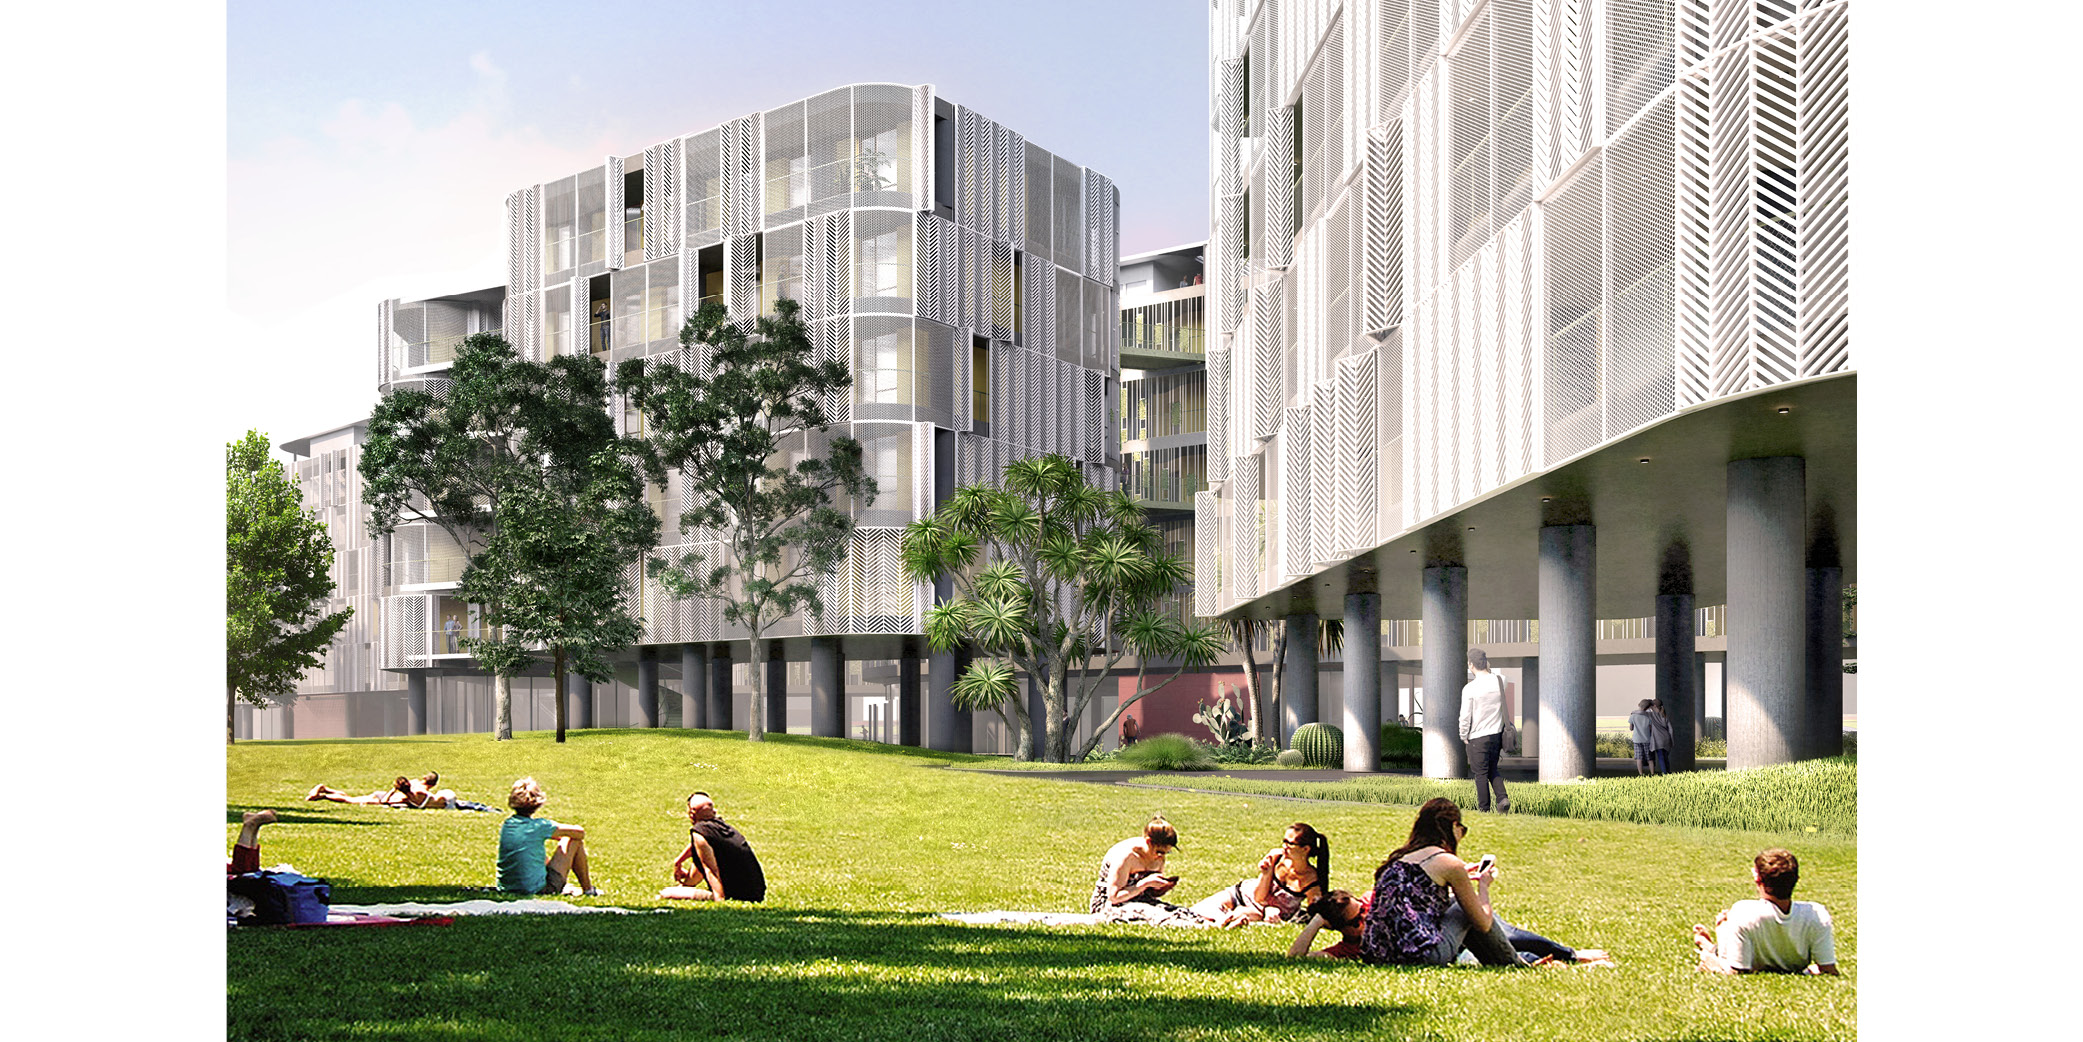 OCA architects Dormitories of the Cyprus University of Technology in Limassol - Κοιτώνες Κύπρος Λεμεσός Hernan Lleida Ruiz Bernardo Garcia Morales 0